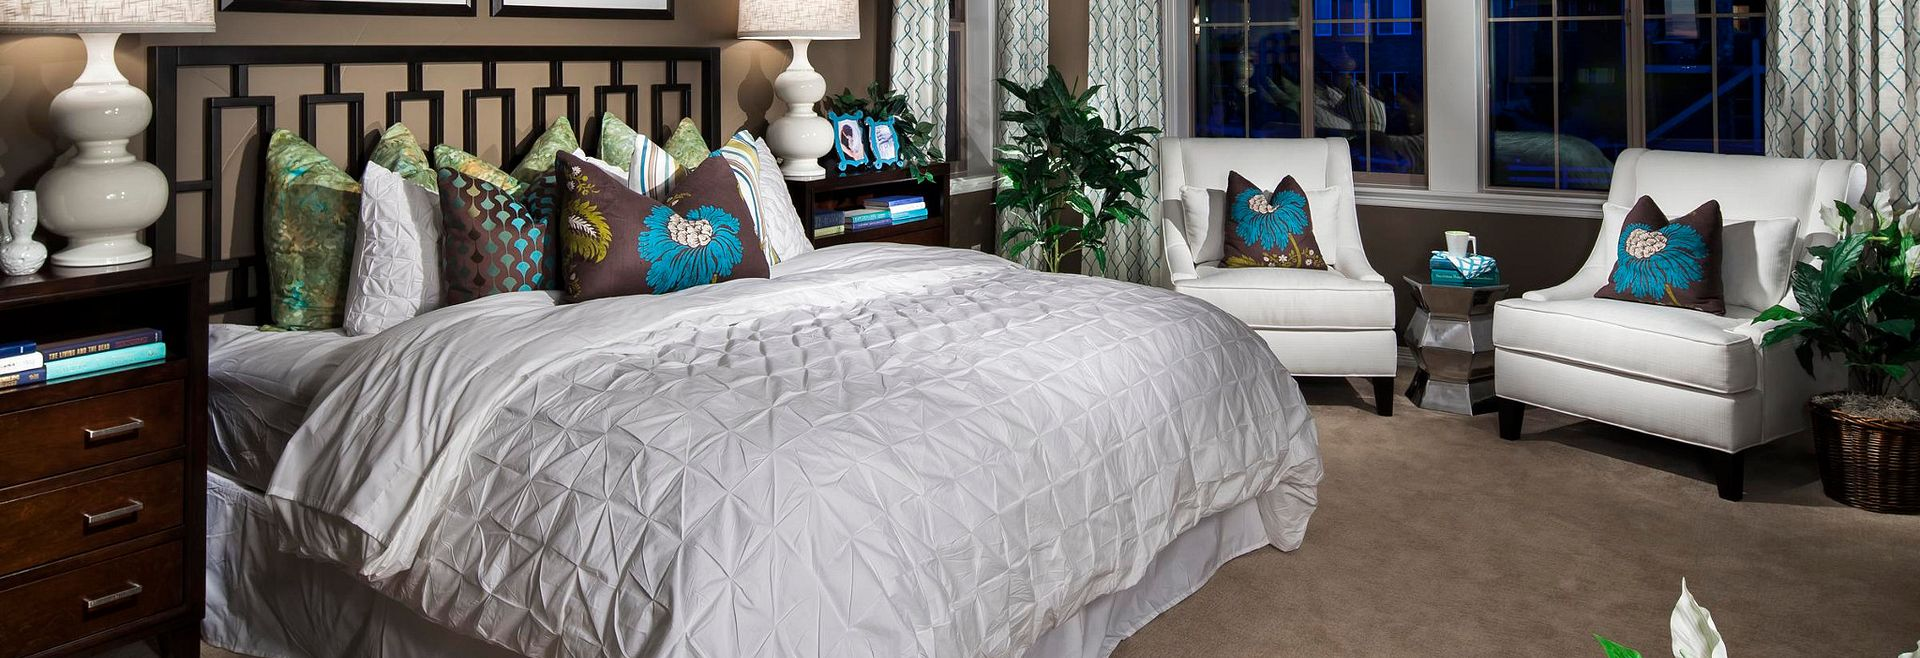 BackCountry Somerset Master Bedroom